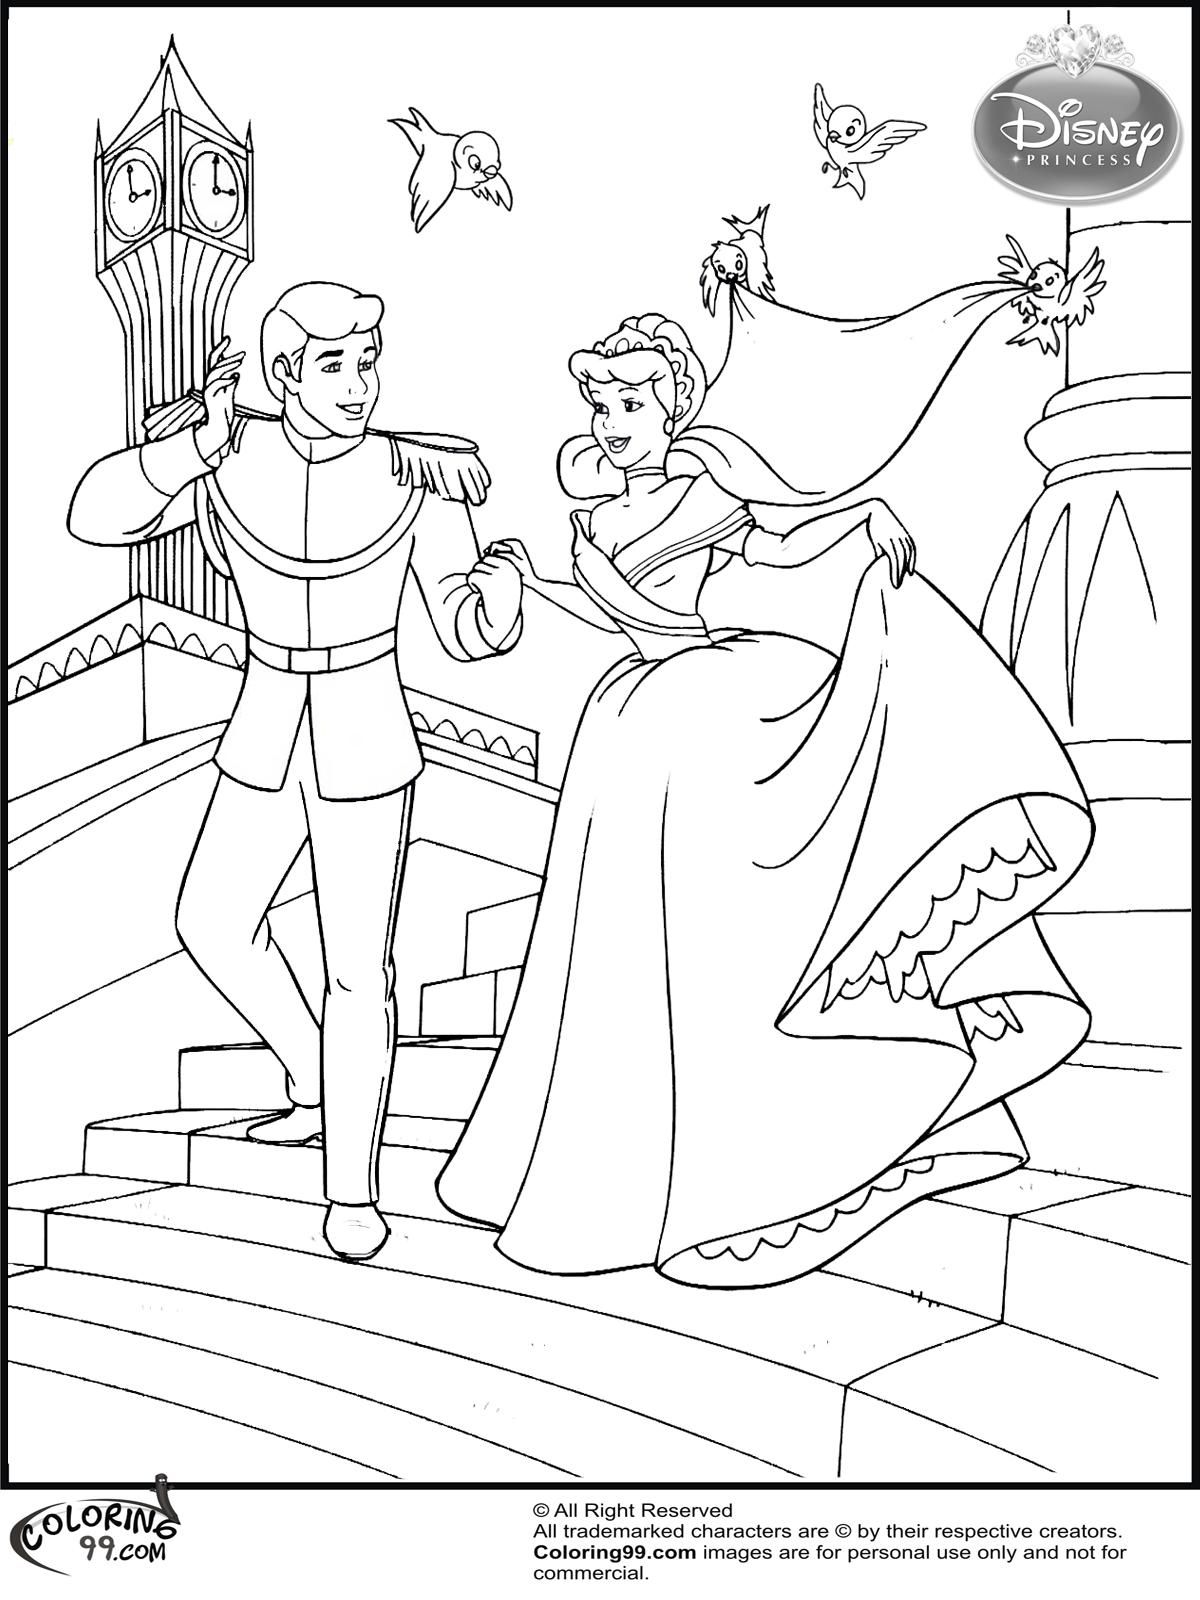 Fans Request - Cinderella Wedding Coloring Pages  Team colors